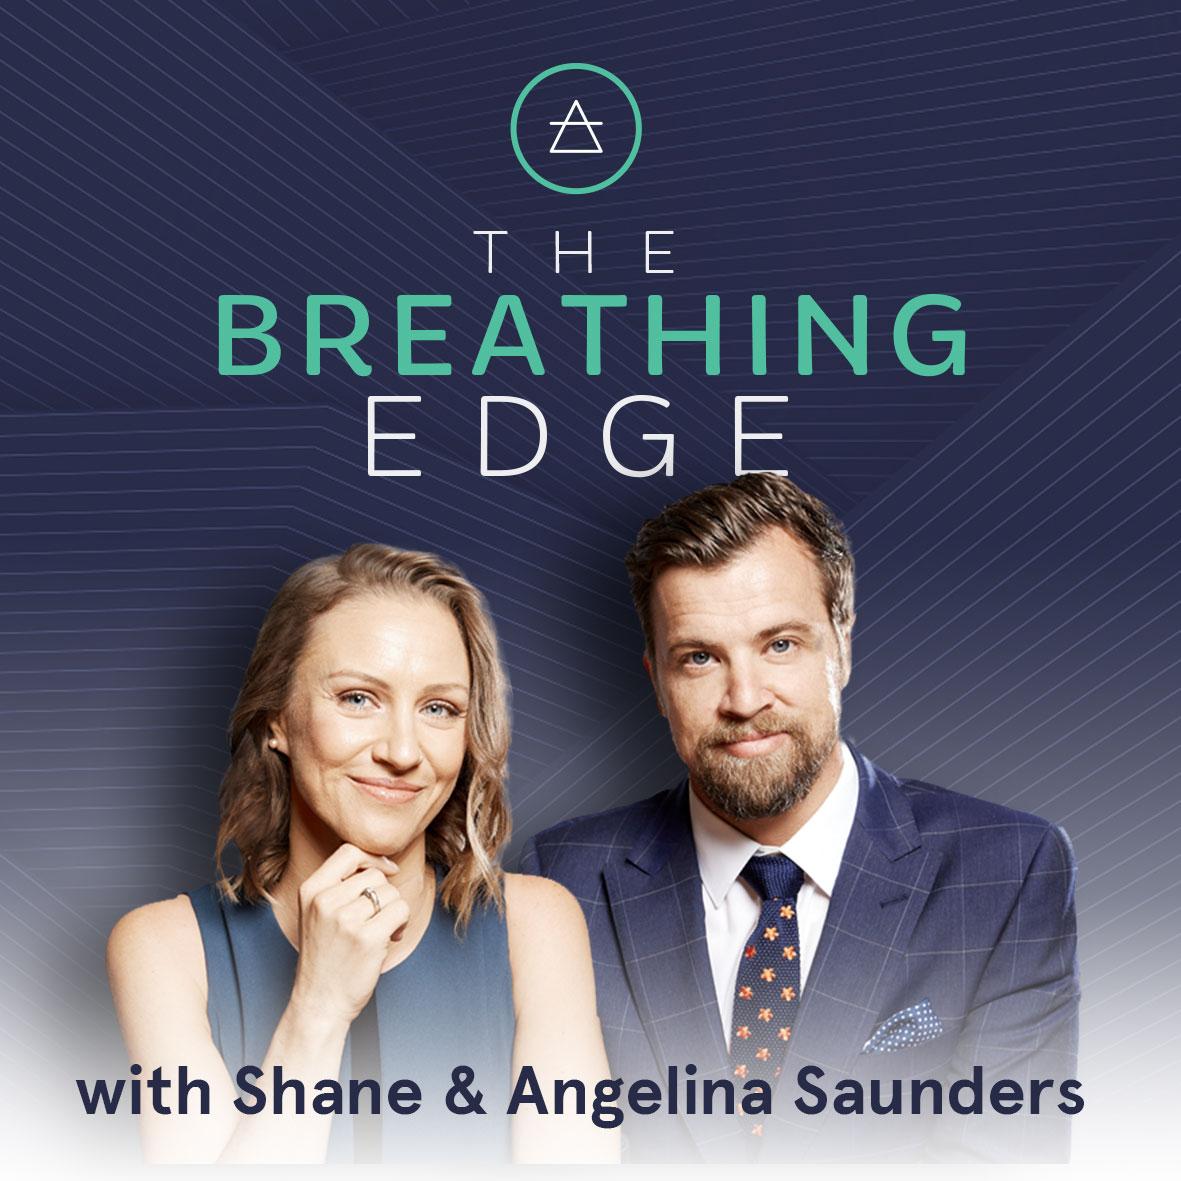 The Breathing Edge